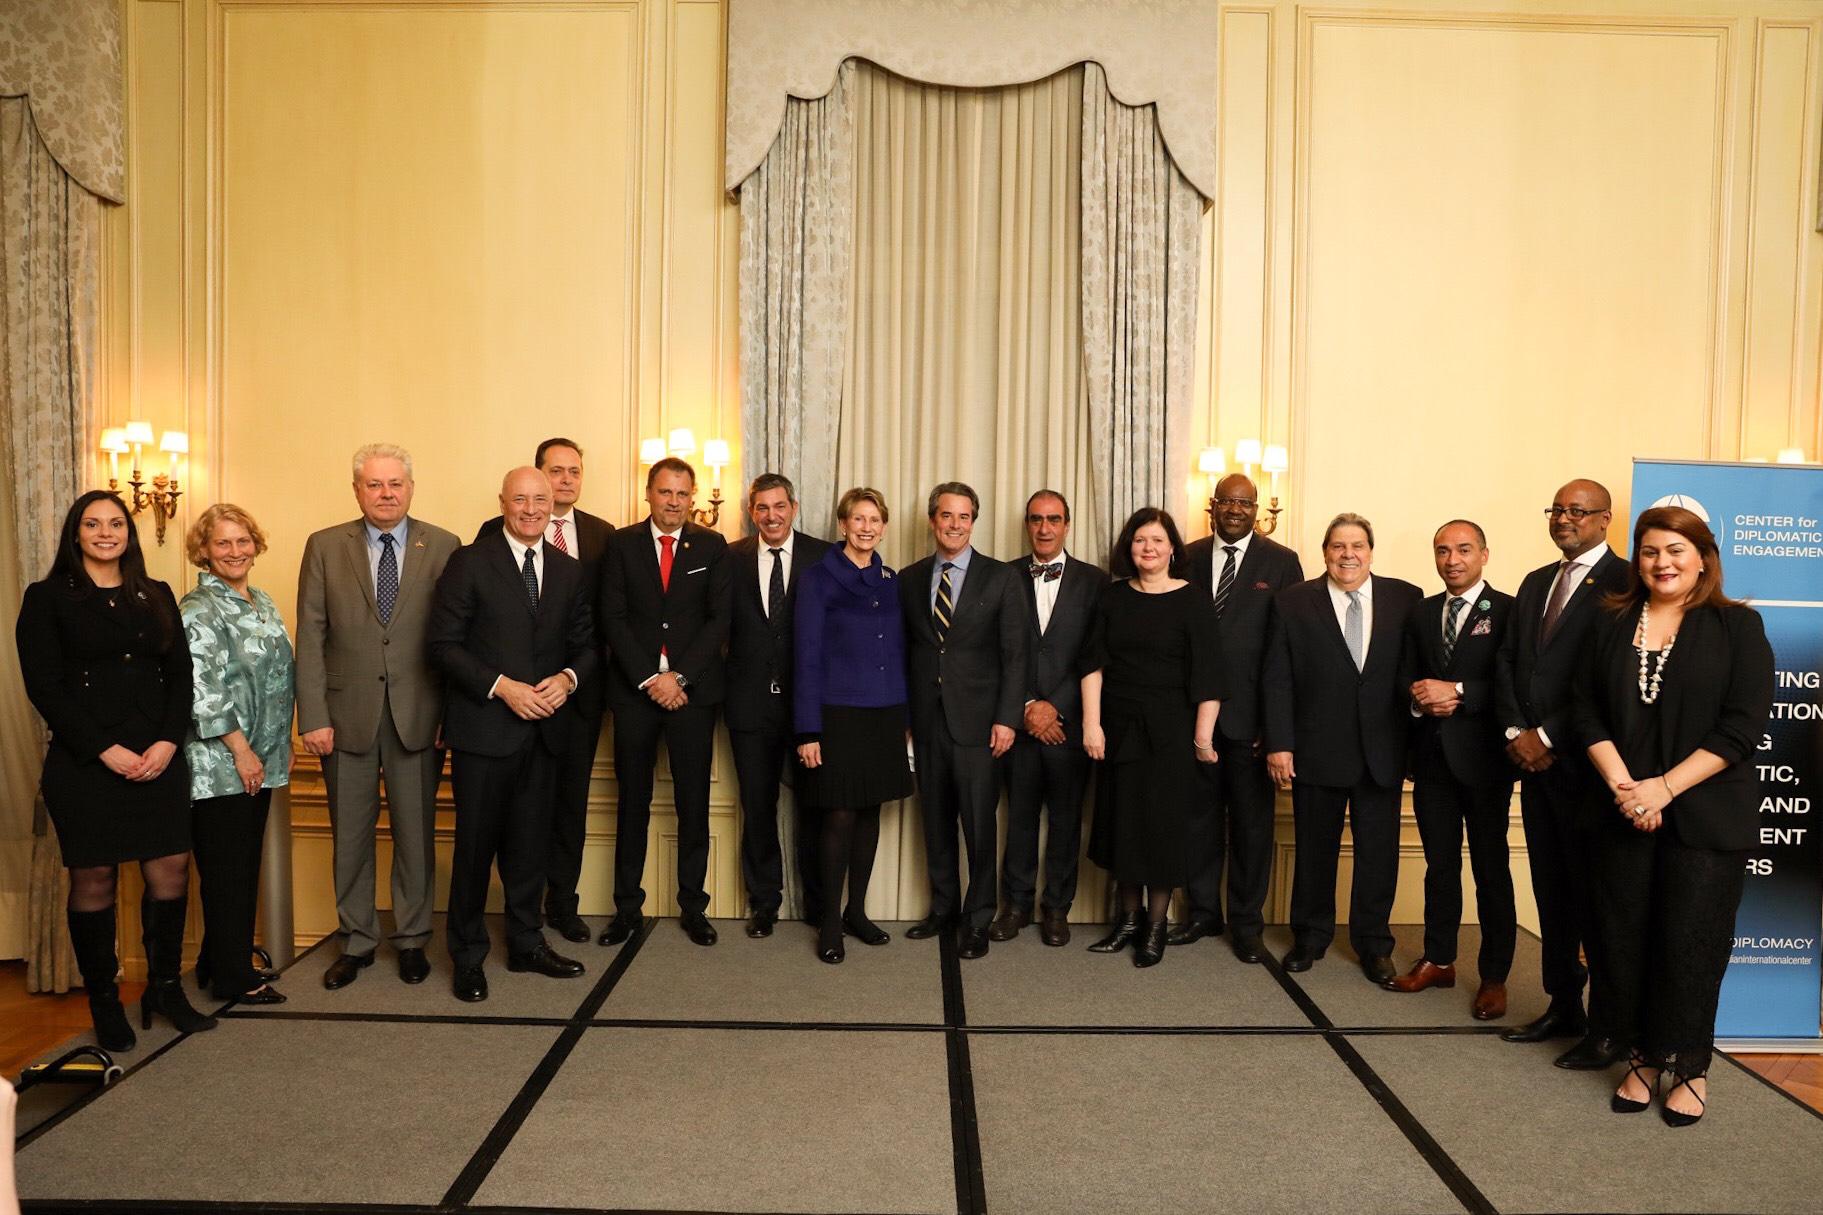 Meridian-Welcome-To-Washington-Ambassadors